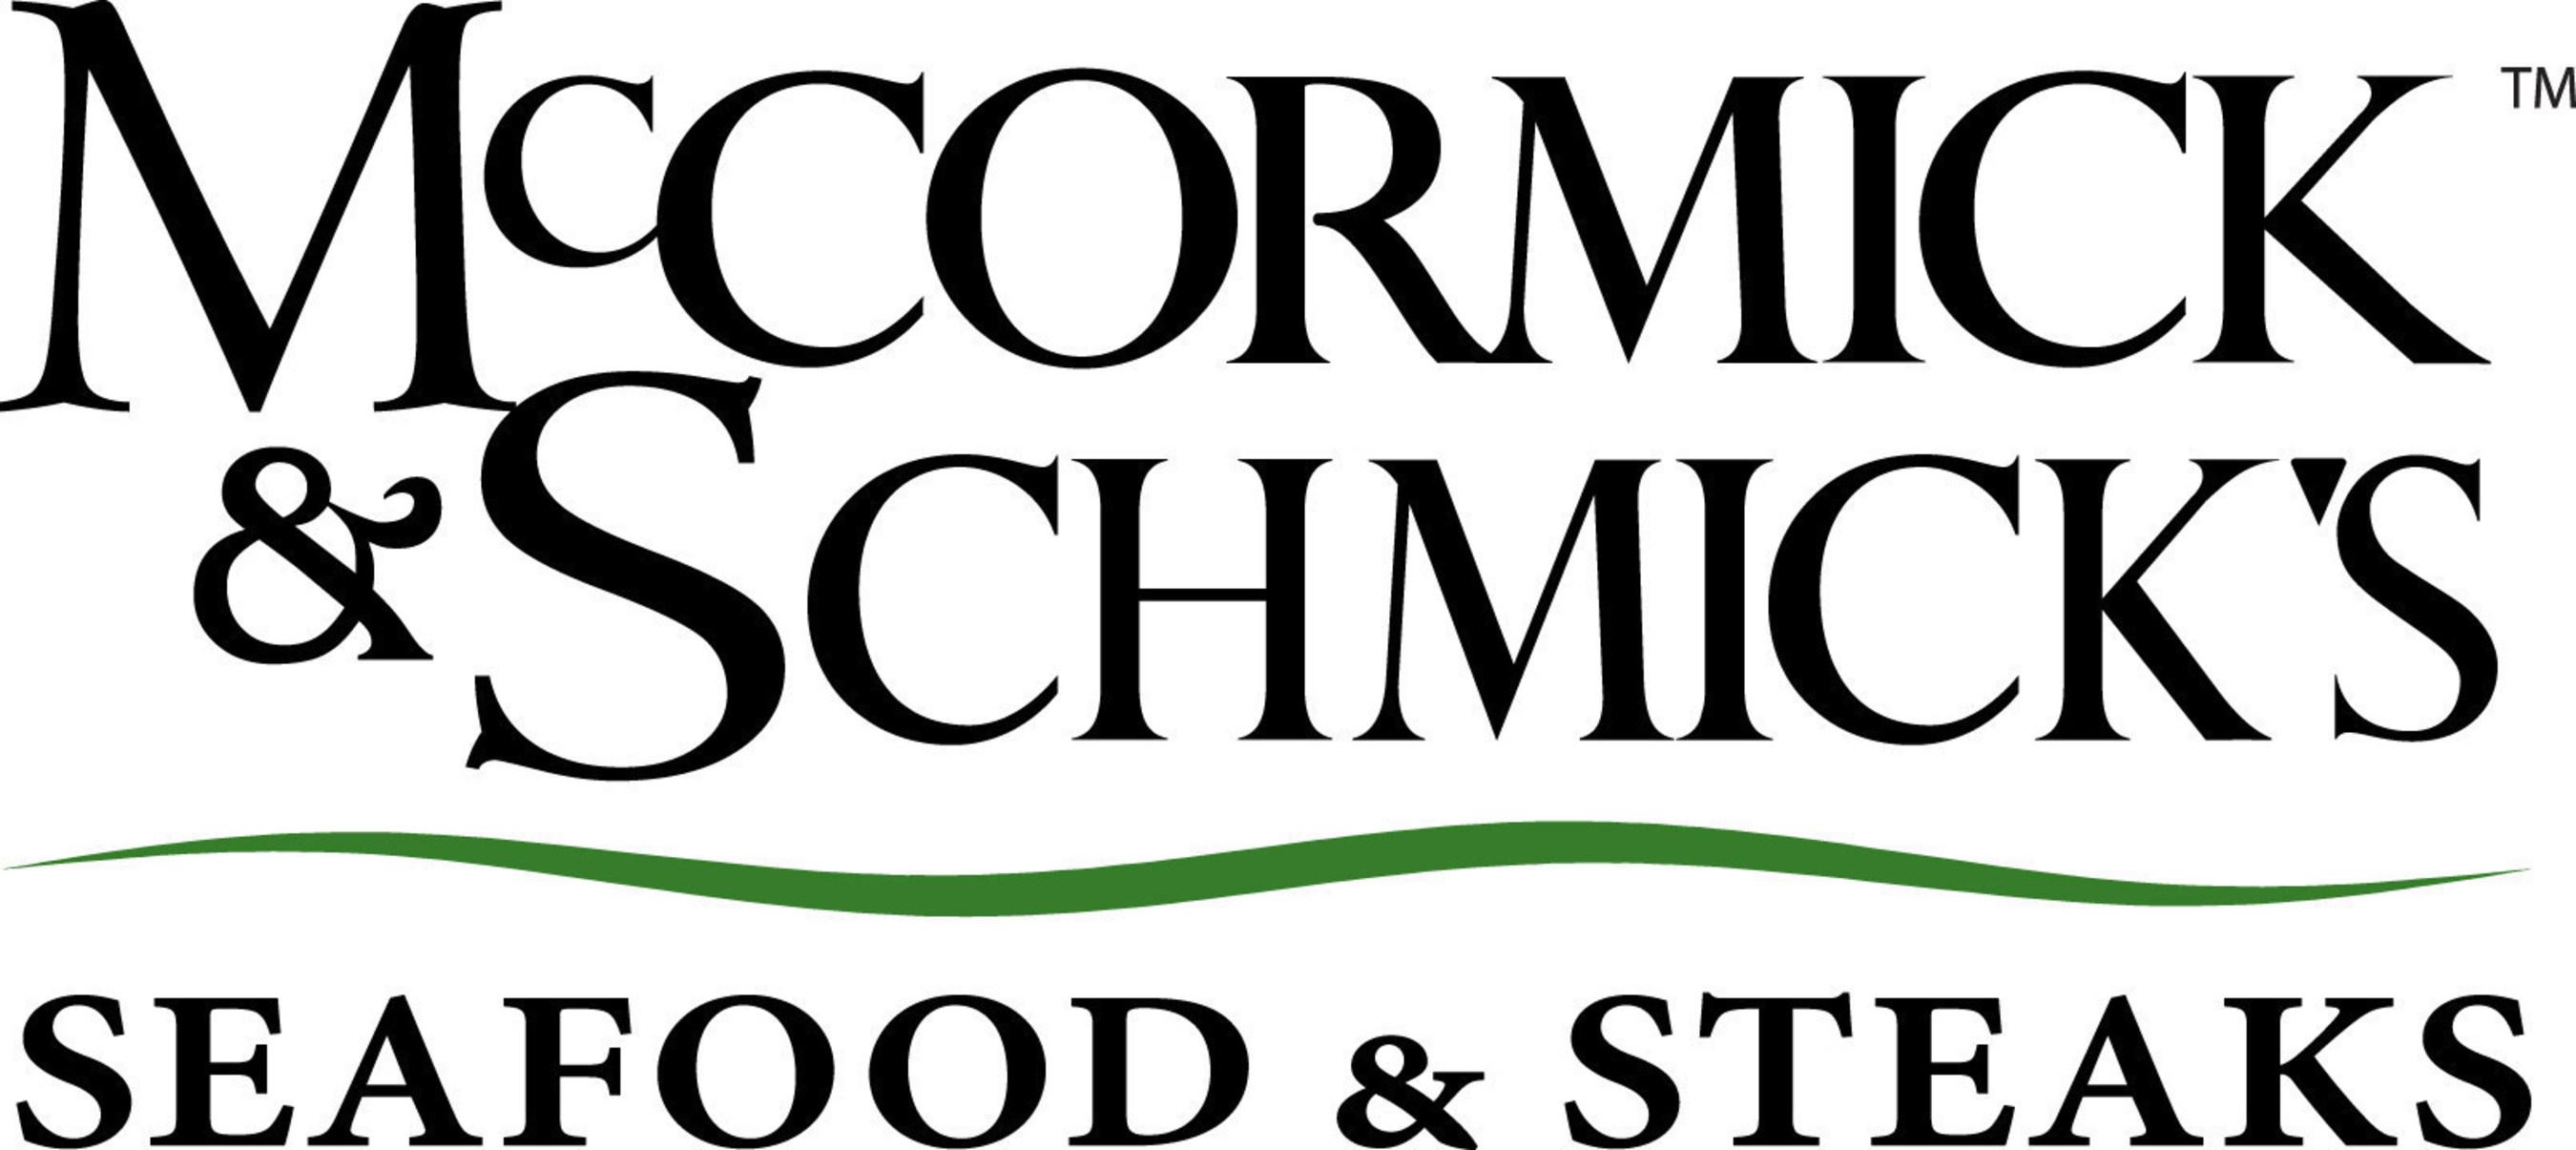 Mccormick Schmick S Seafood Restaurants Recognize U S